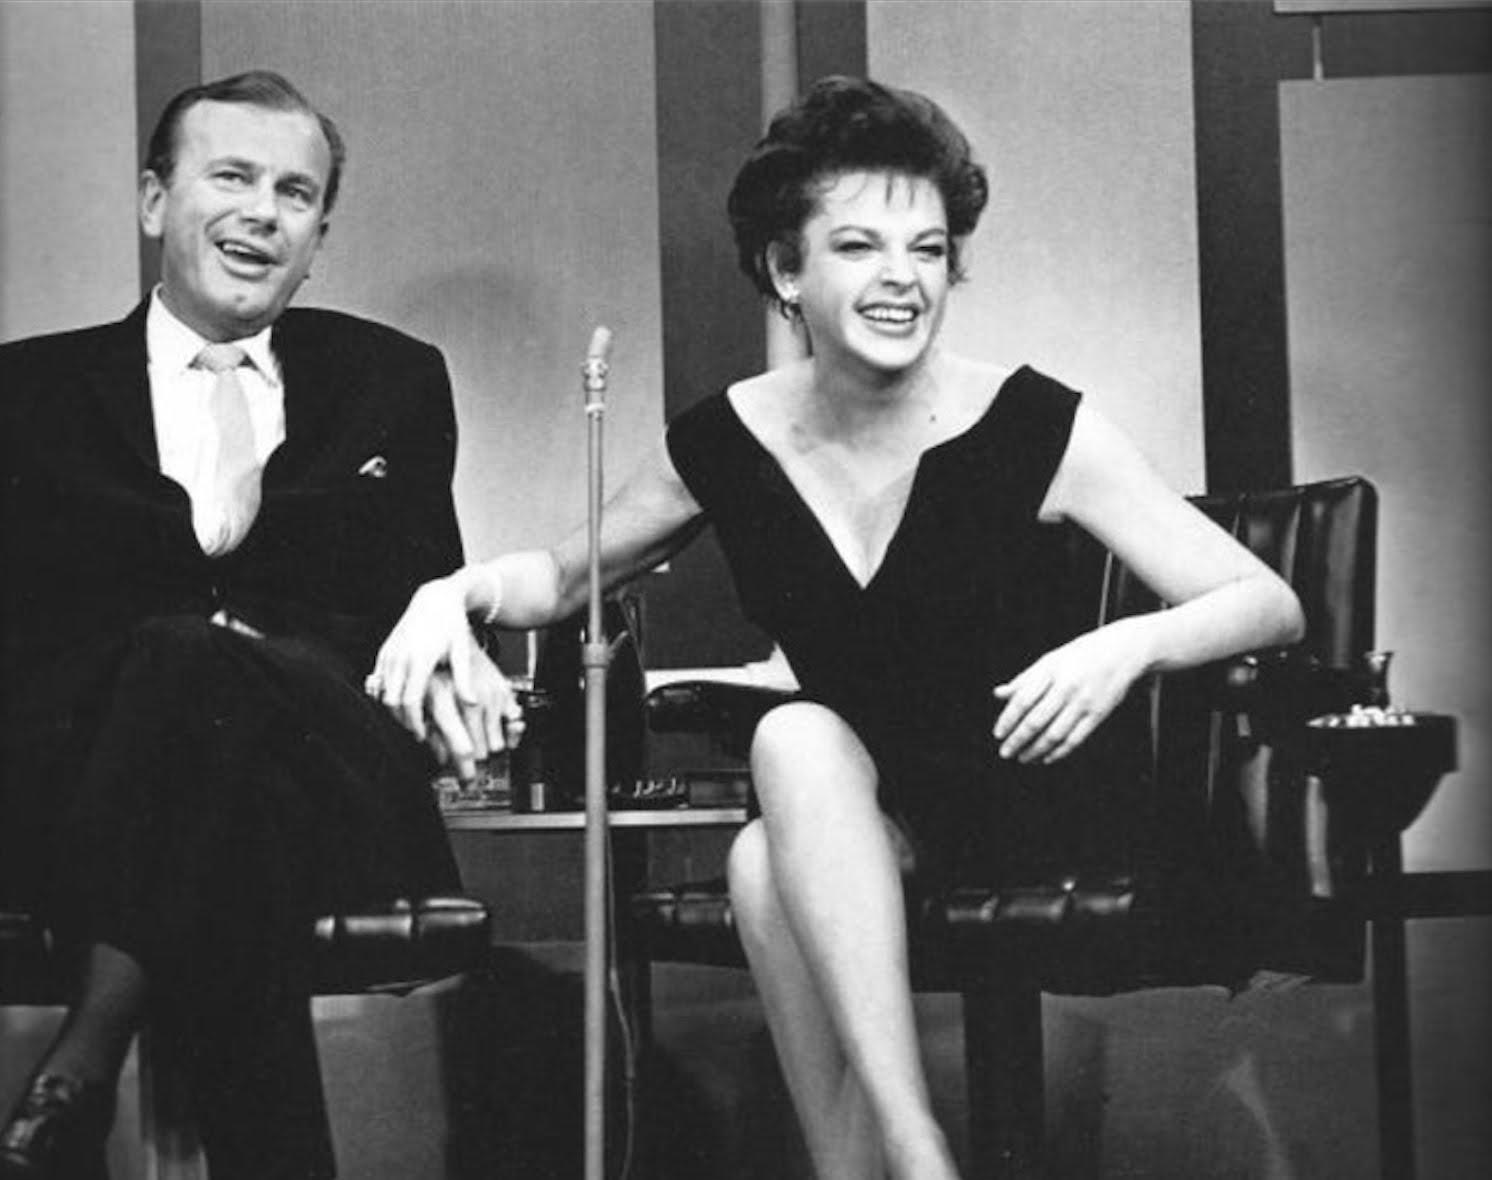 Jack Paar with Judy Garland